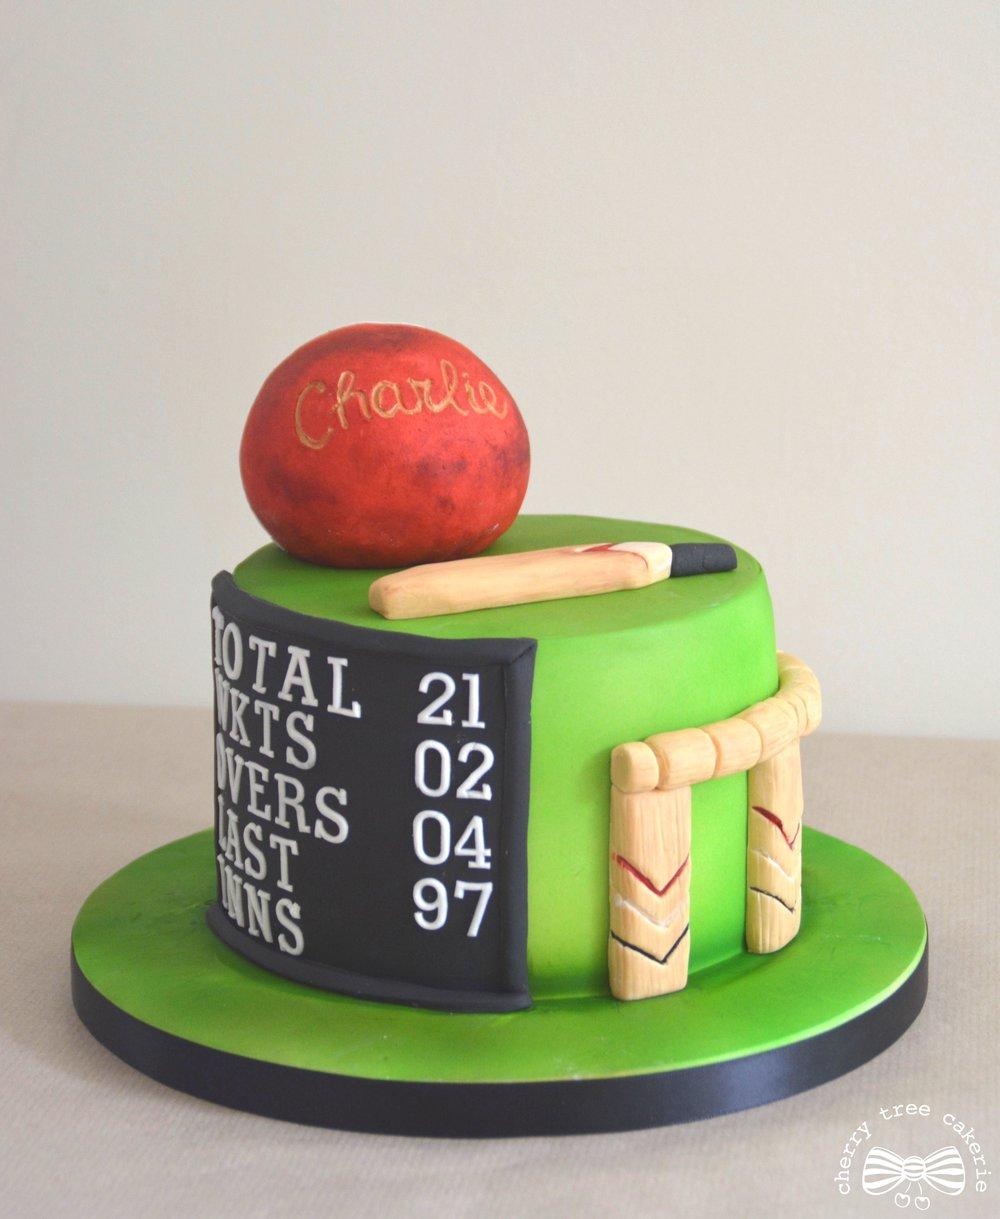 Cricket_themed_cake.jpg